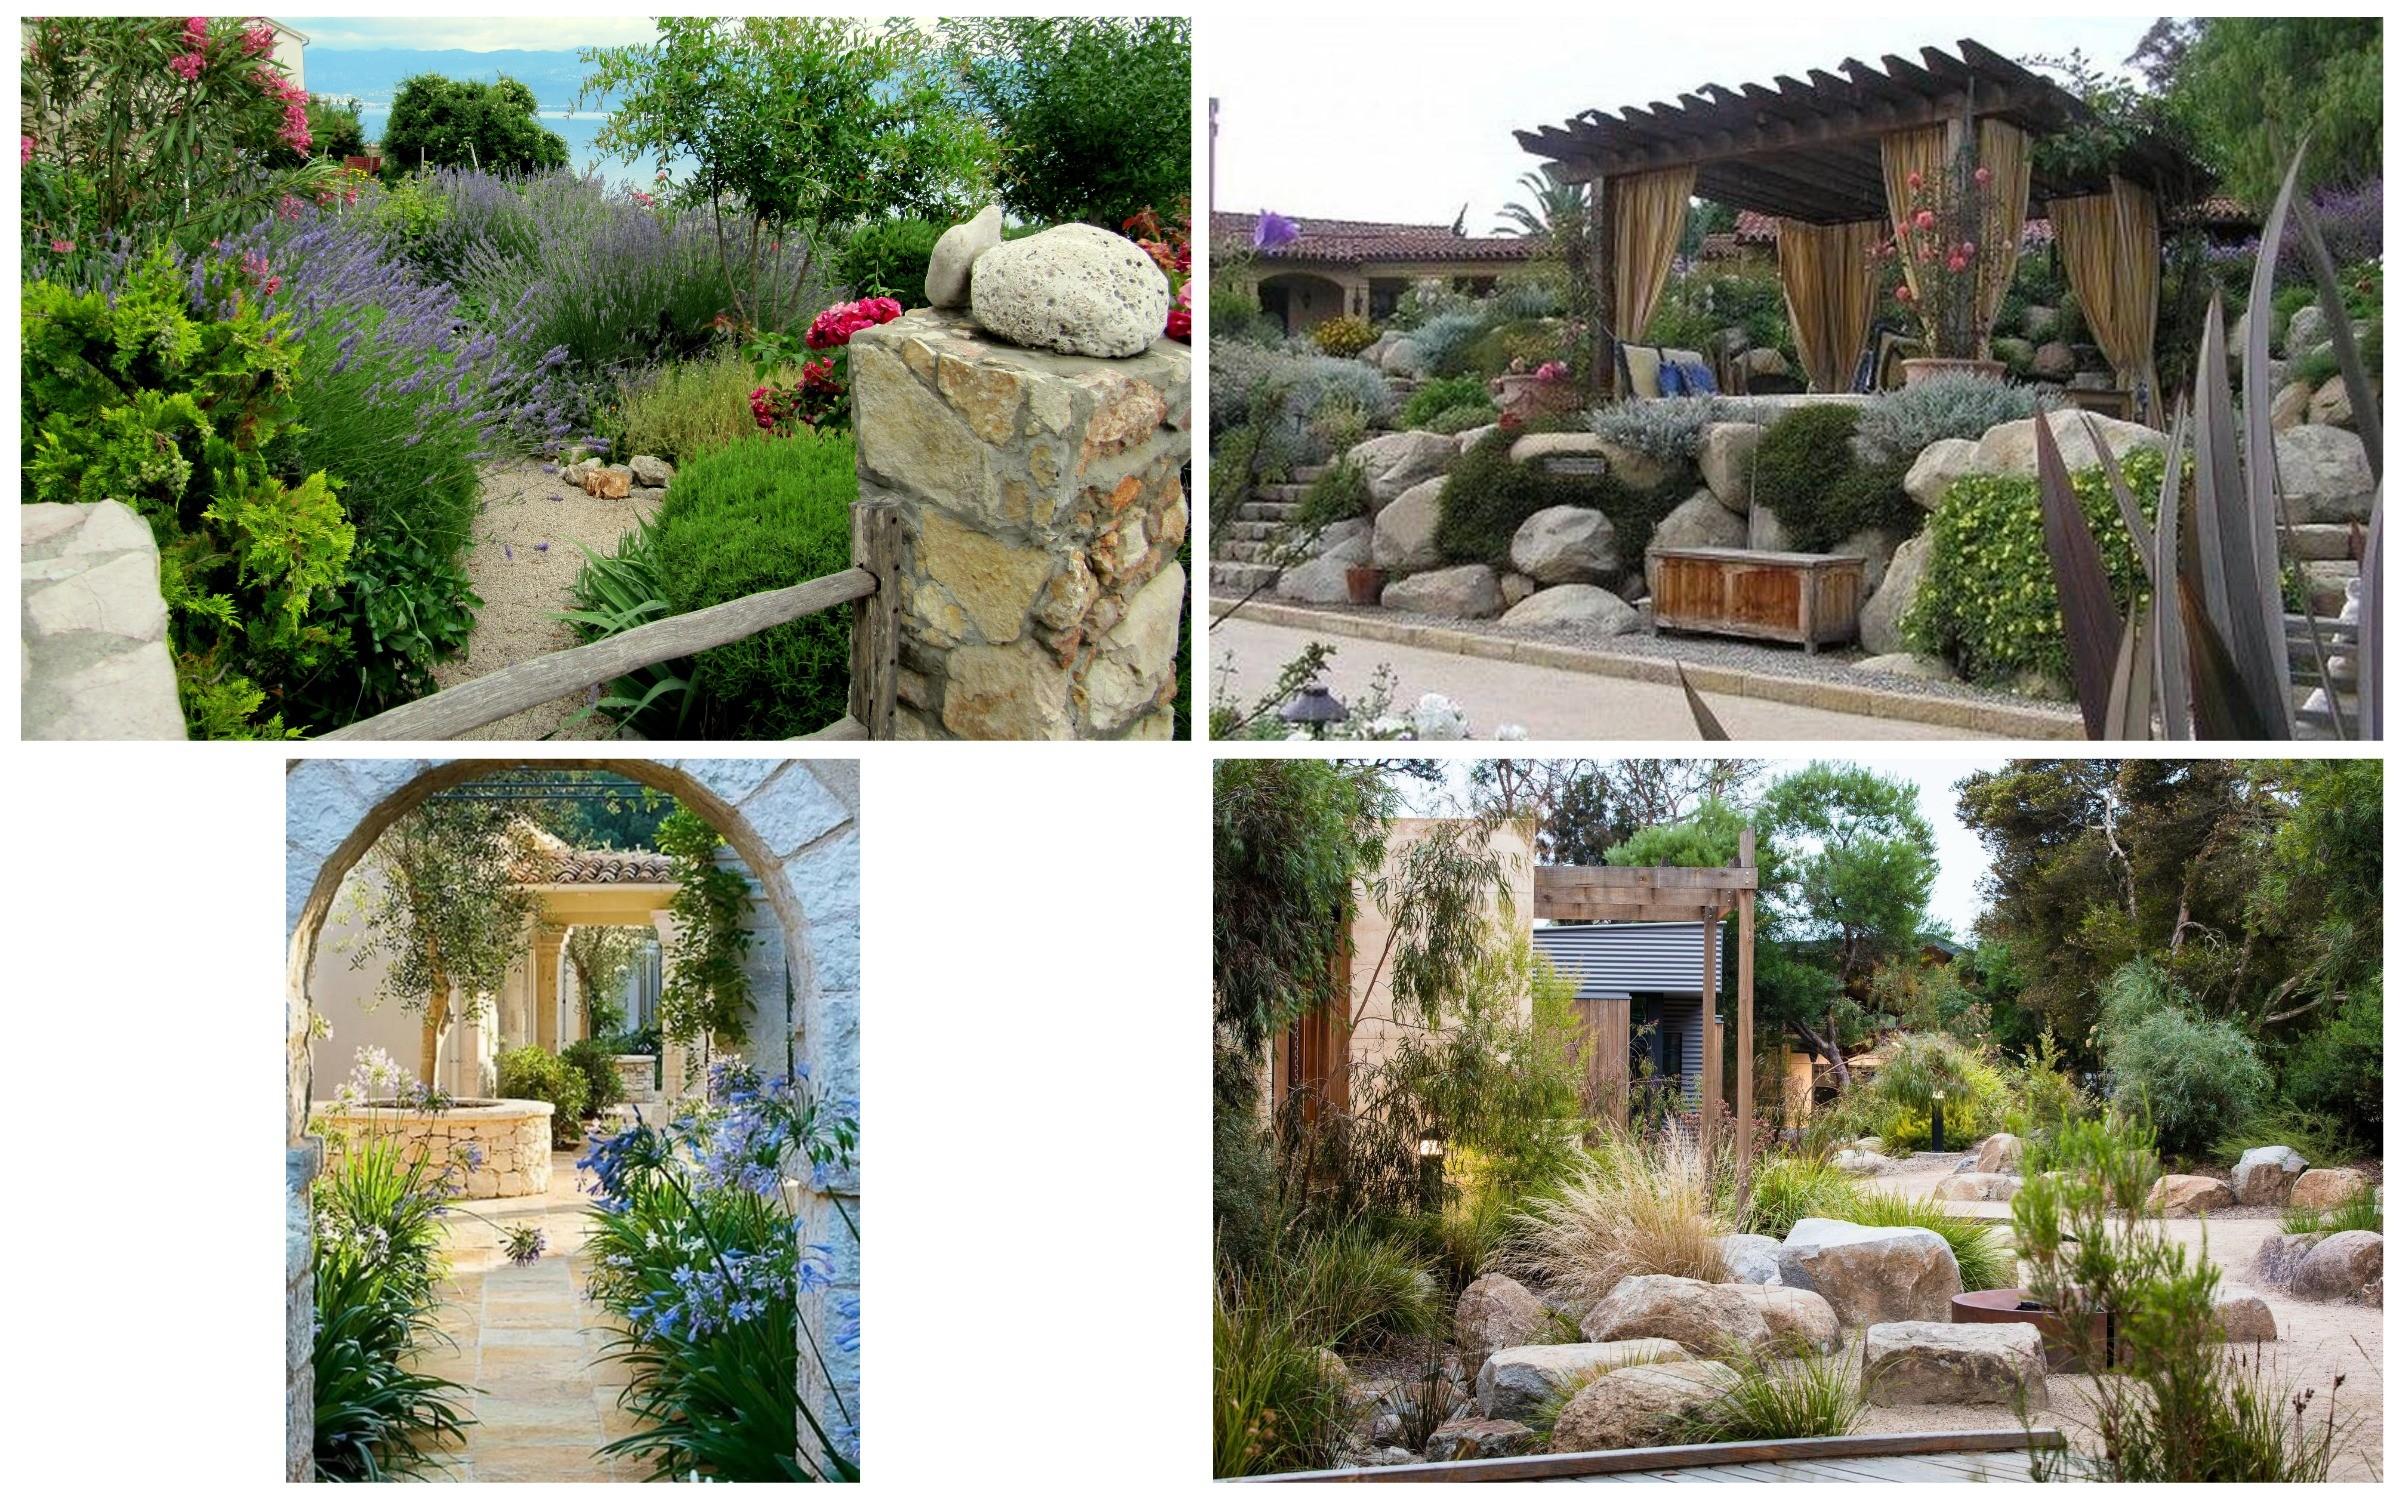 фото присутствия камней в средиземноморском стиле сада